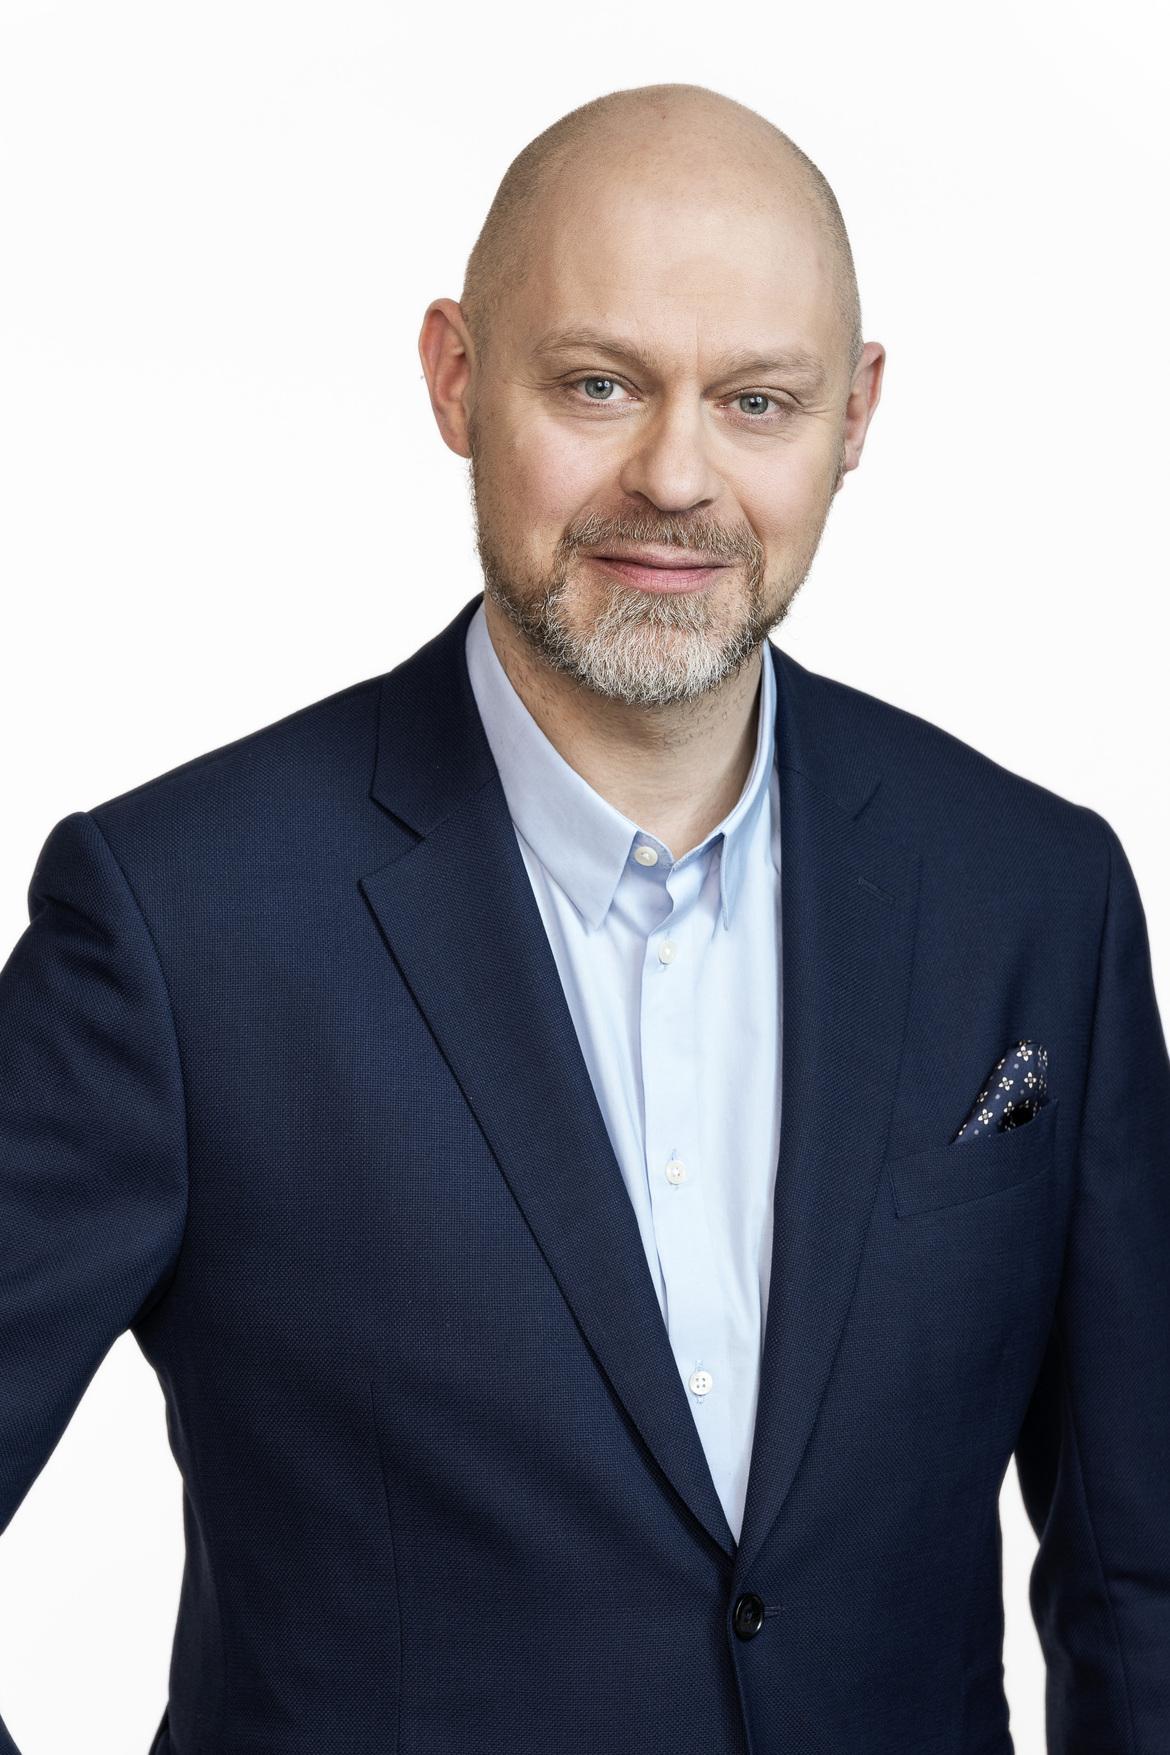 Magnus Östh/TR Bild.